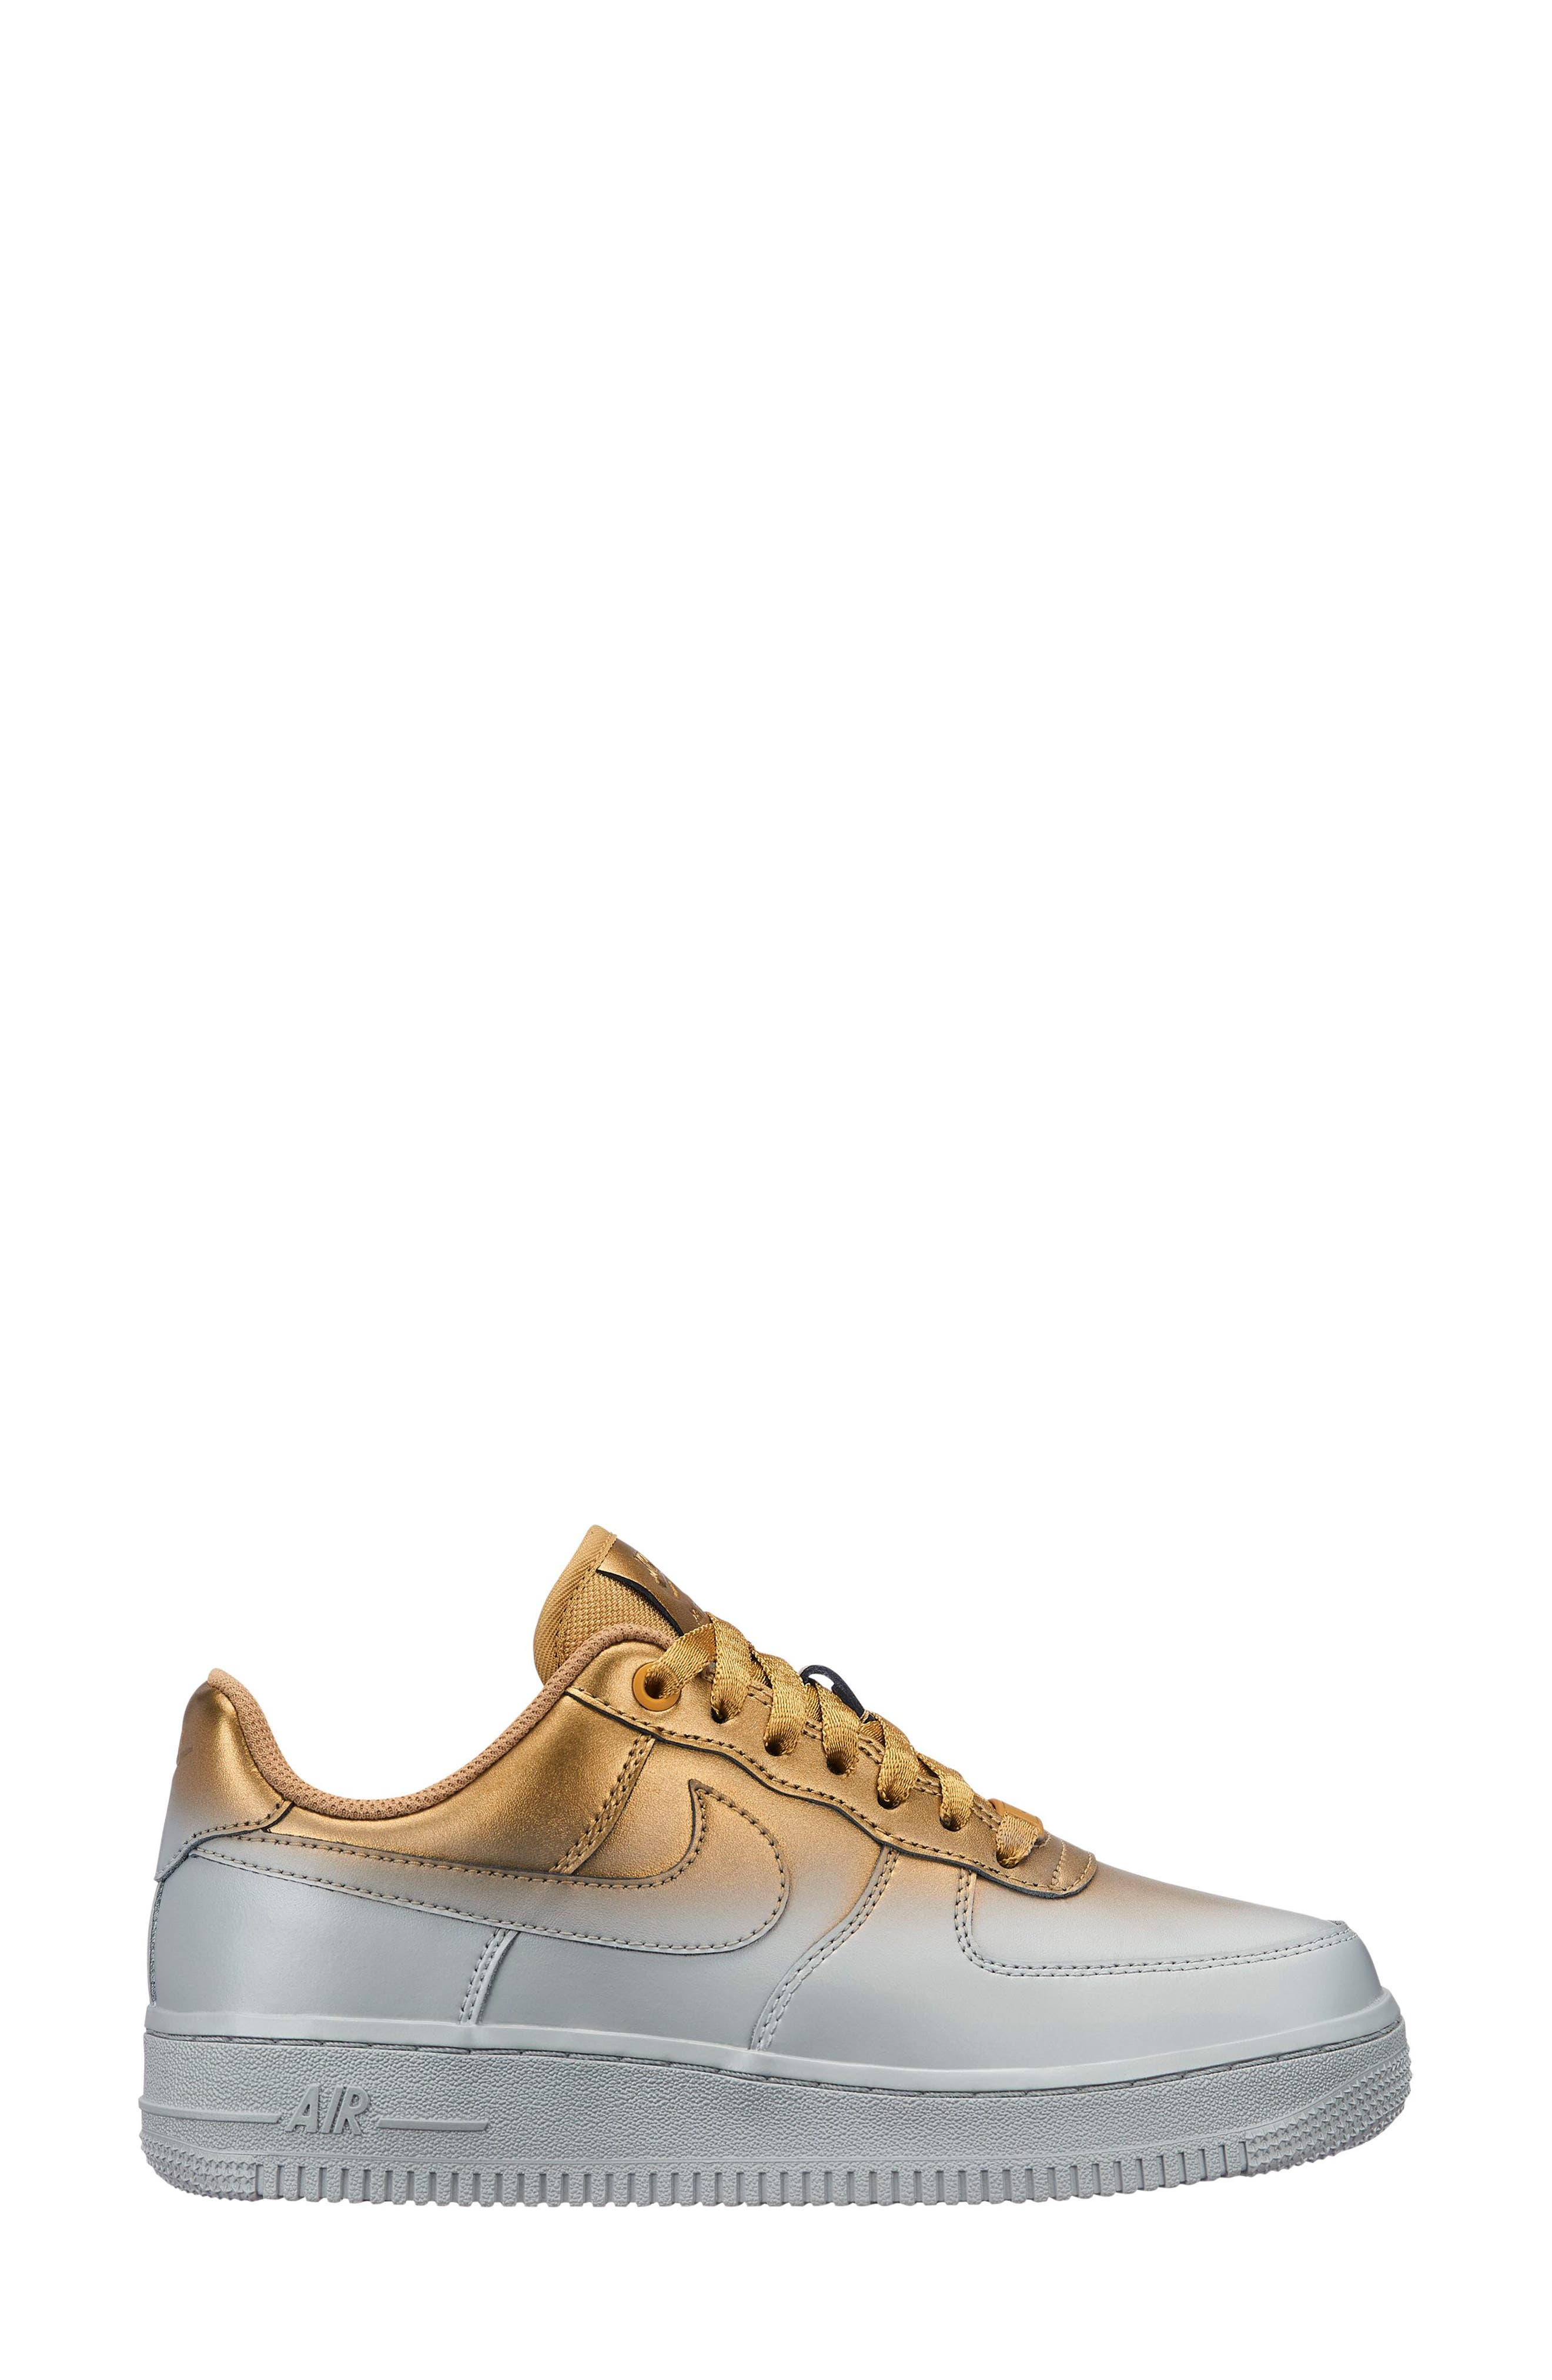 NIKE,                             Air Force 1 '07 LX Sneaker,                             Main thumbnail 1, color,                             METALLIC PLATINUM/ GOLD